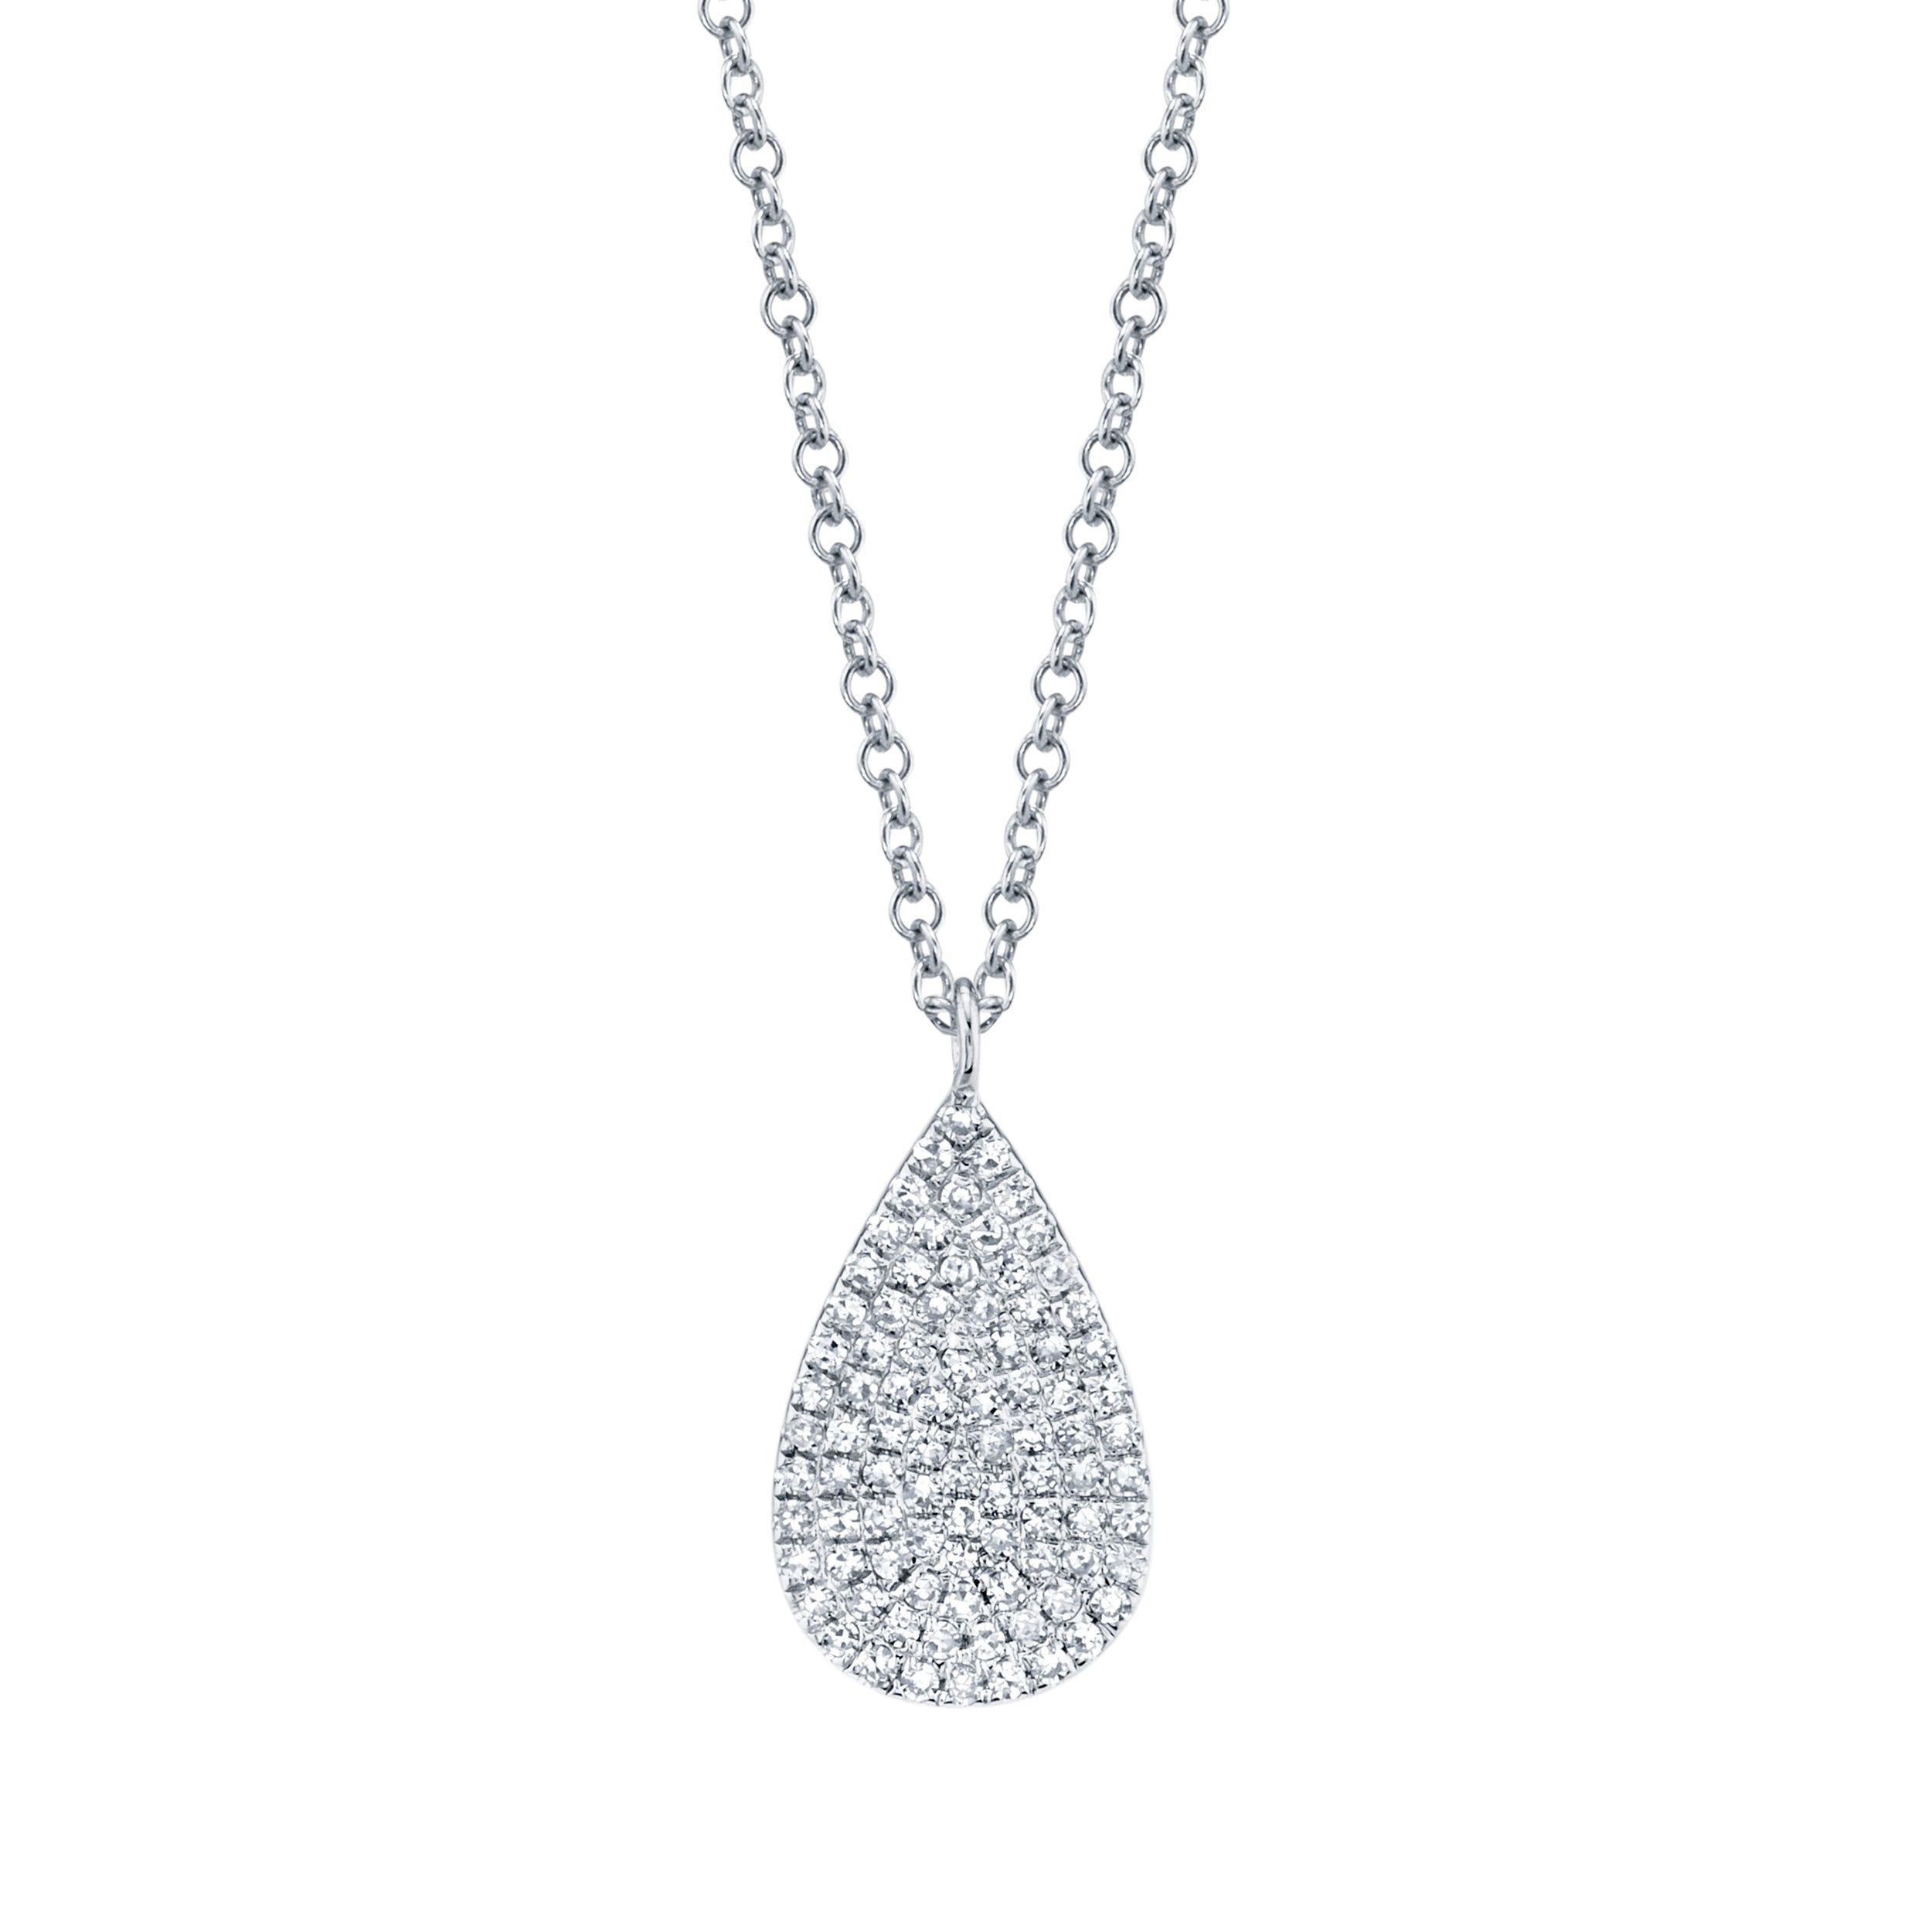 Shy Creation Diamond Teardrop Cluster Pendant in 14k White Gold SC55002001